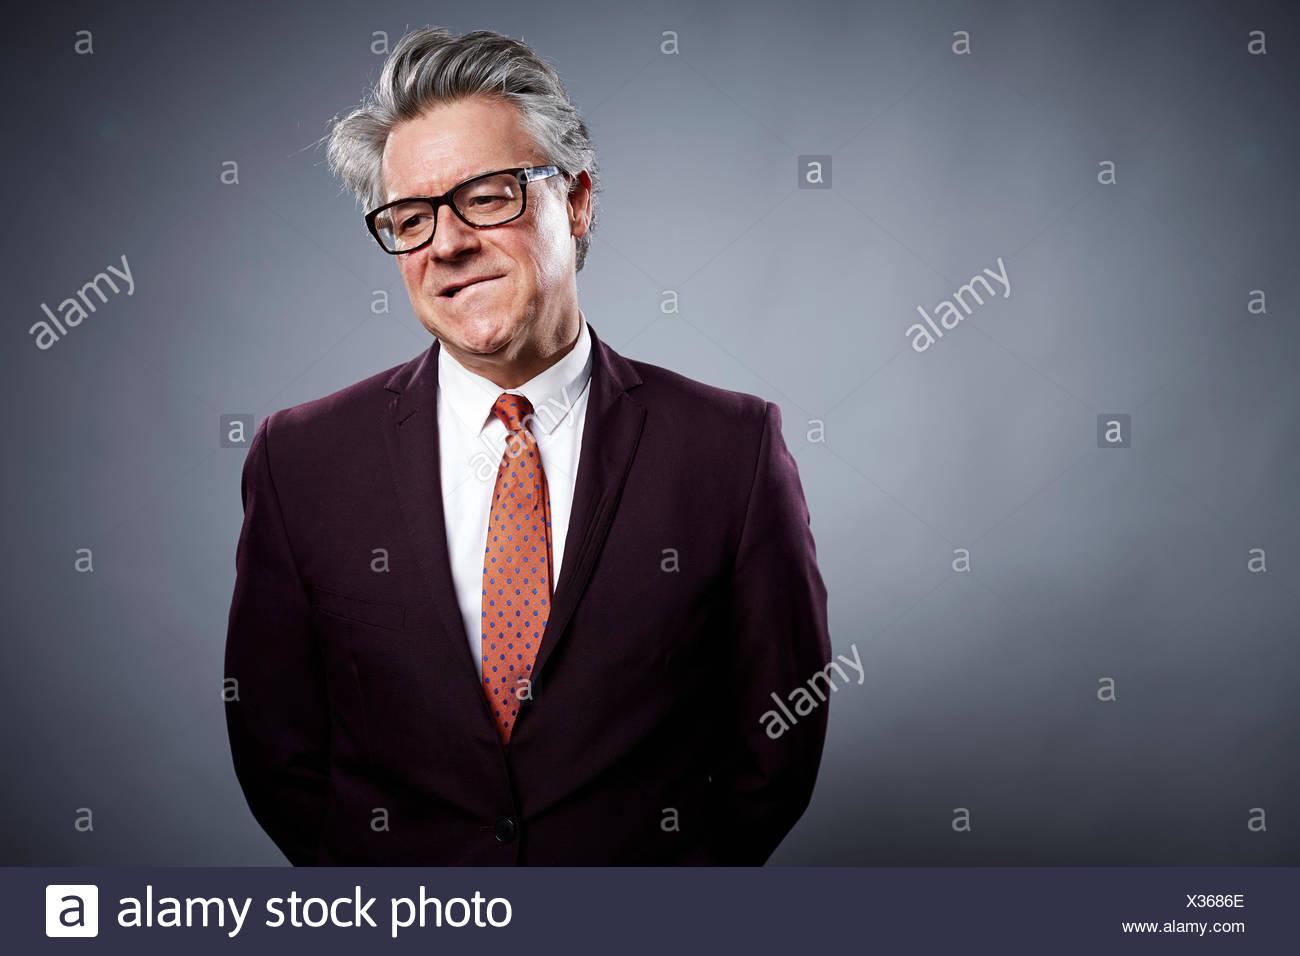 Studio portrait of businessman biting his lip - Stock Image